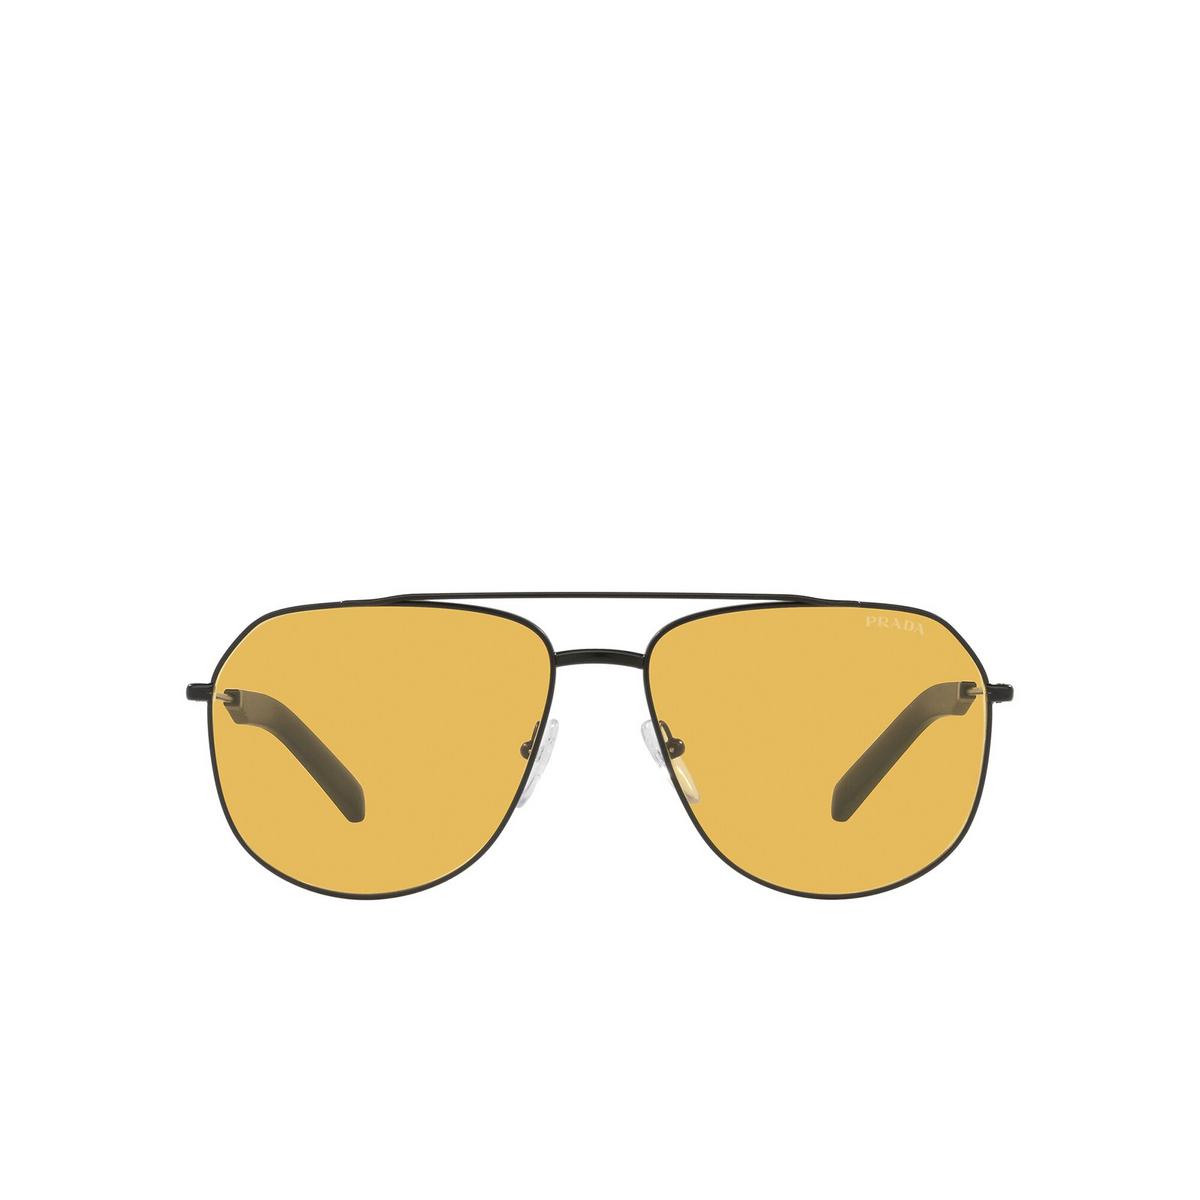 Prada® Aviator Sunglasses: PR 59WS color Matte Black 1BO07M - front view.